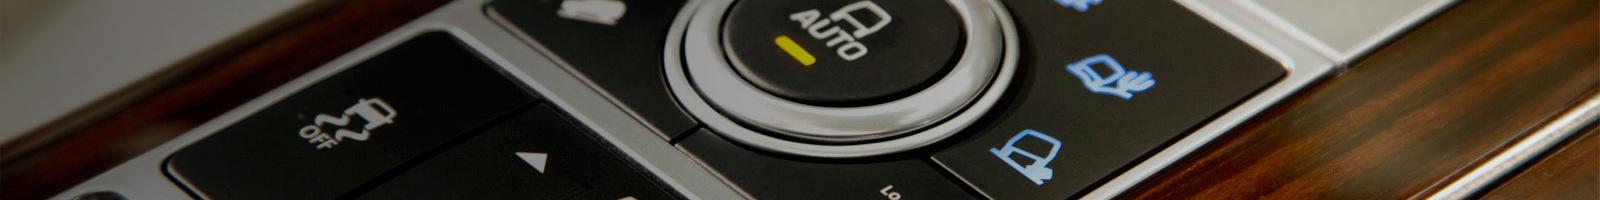 LR_Range_Rover_Detail_02_hc_1_281-80860_1600x900